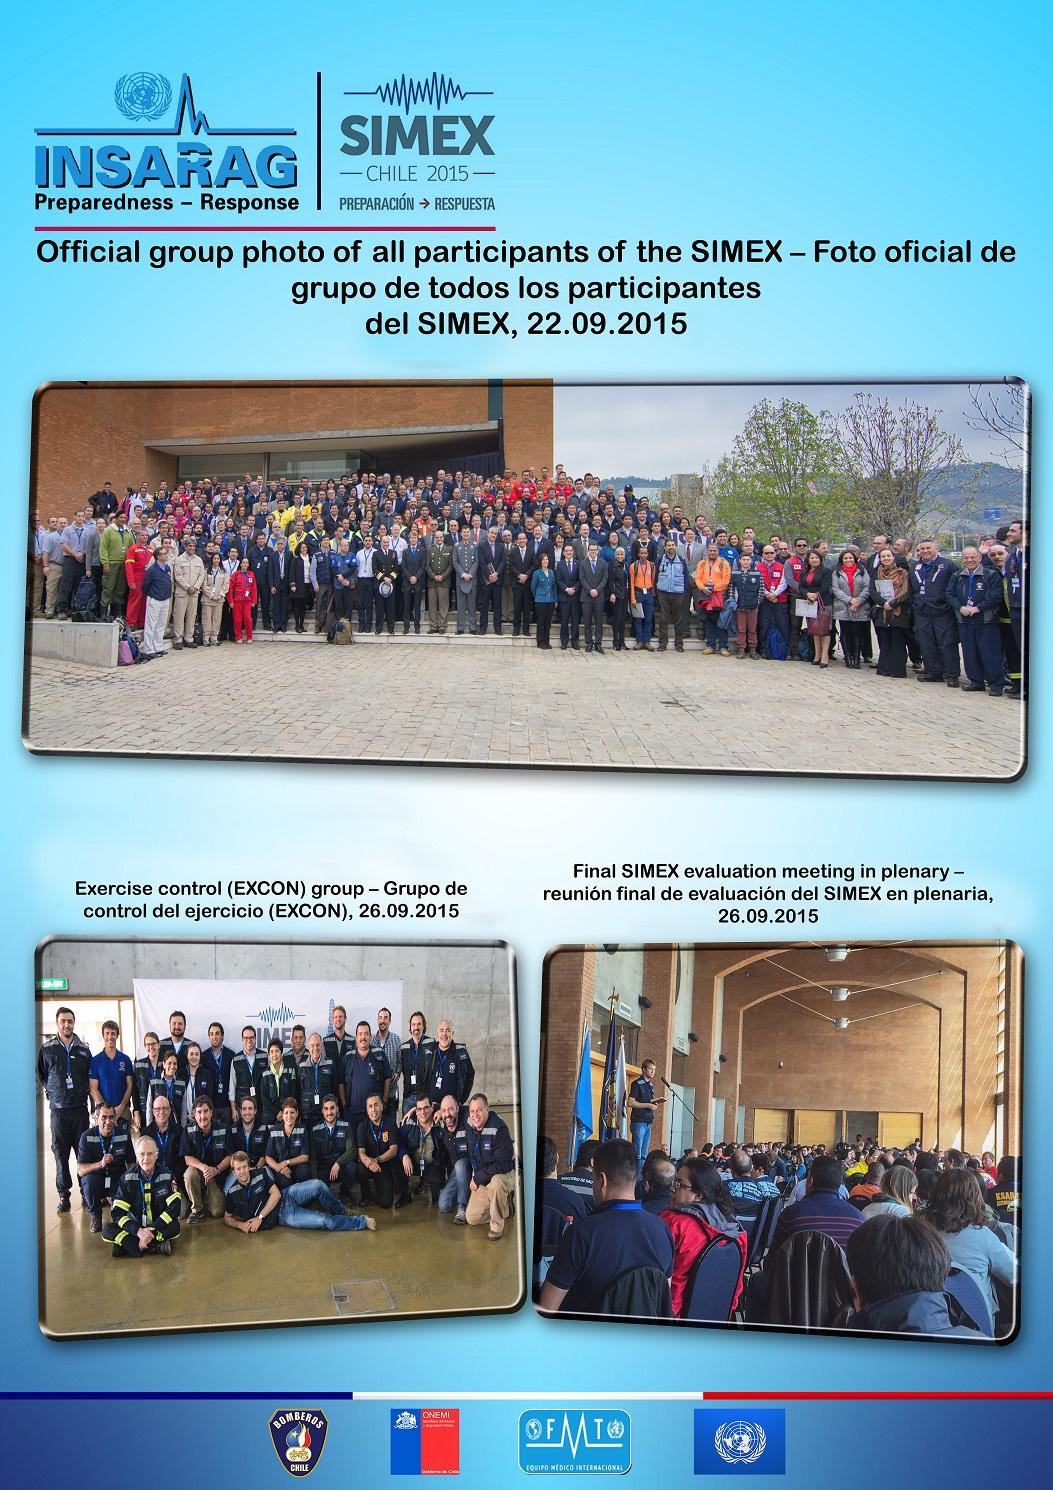 SIMEX_Chile_2015_02_group_photos